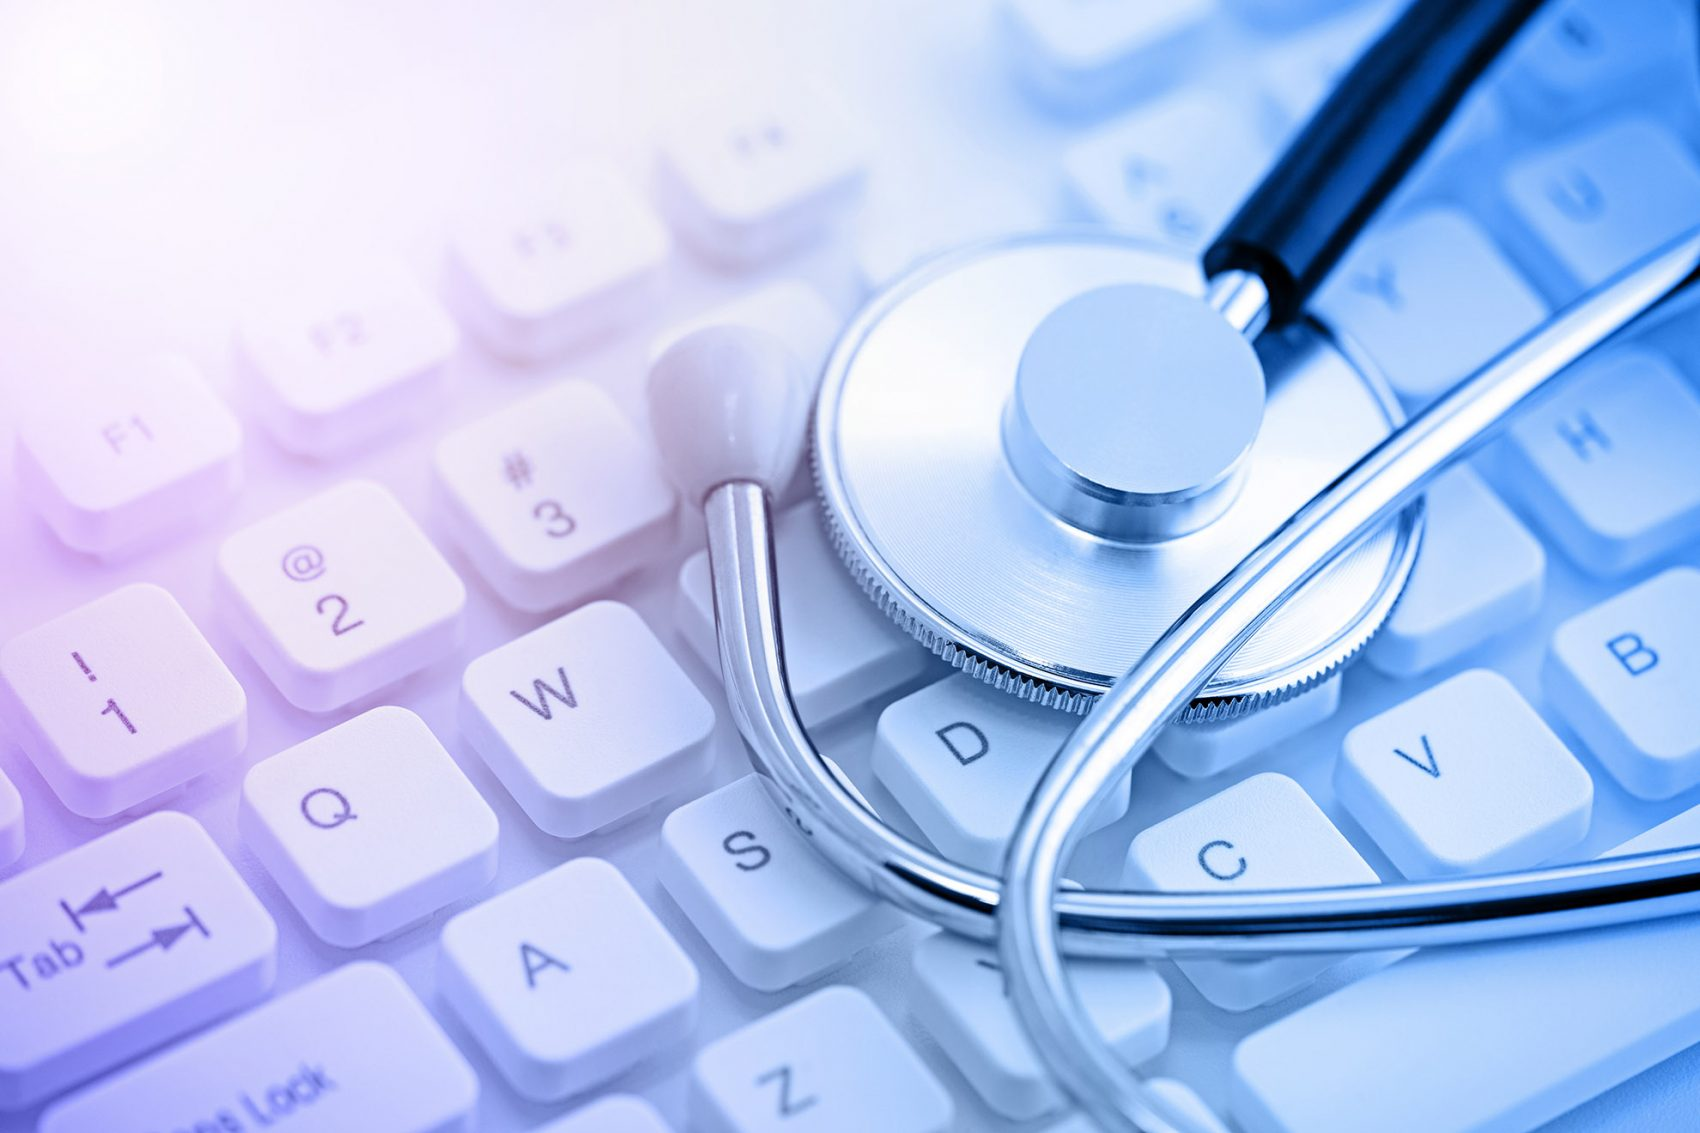 stethoscope on keyboard-healthcare-orginal